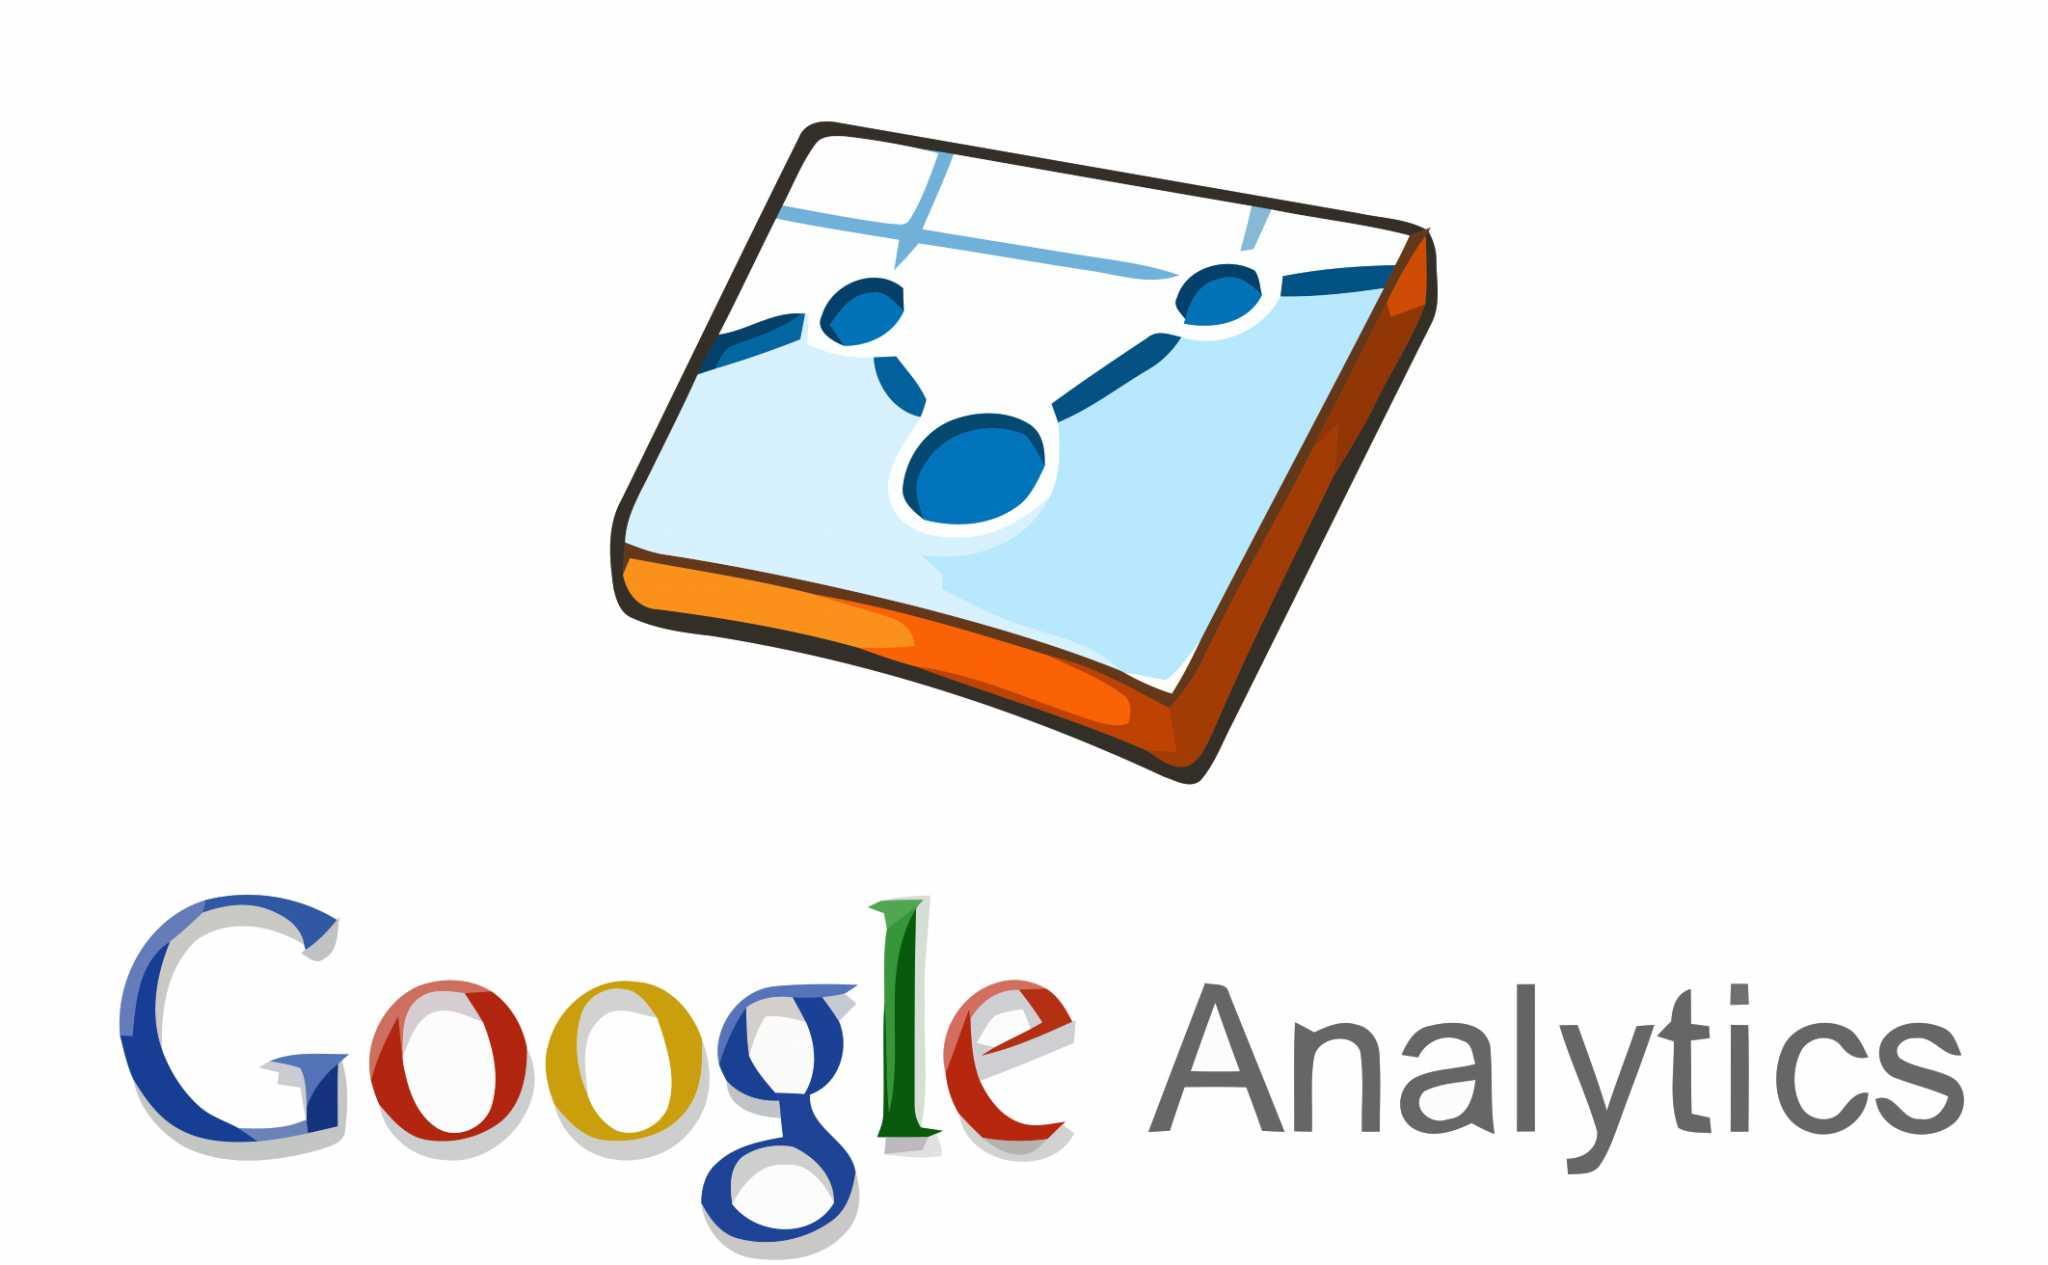 Relatórios Google Analytics